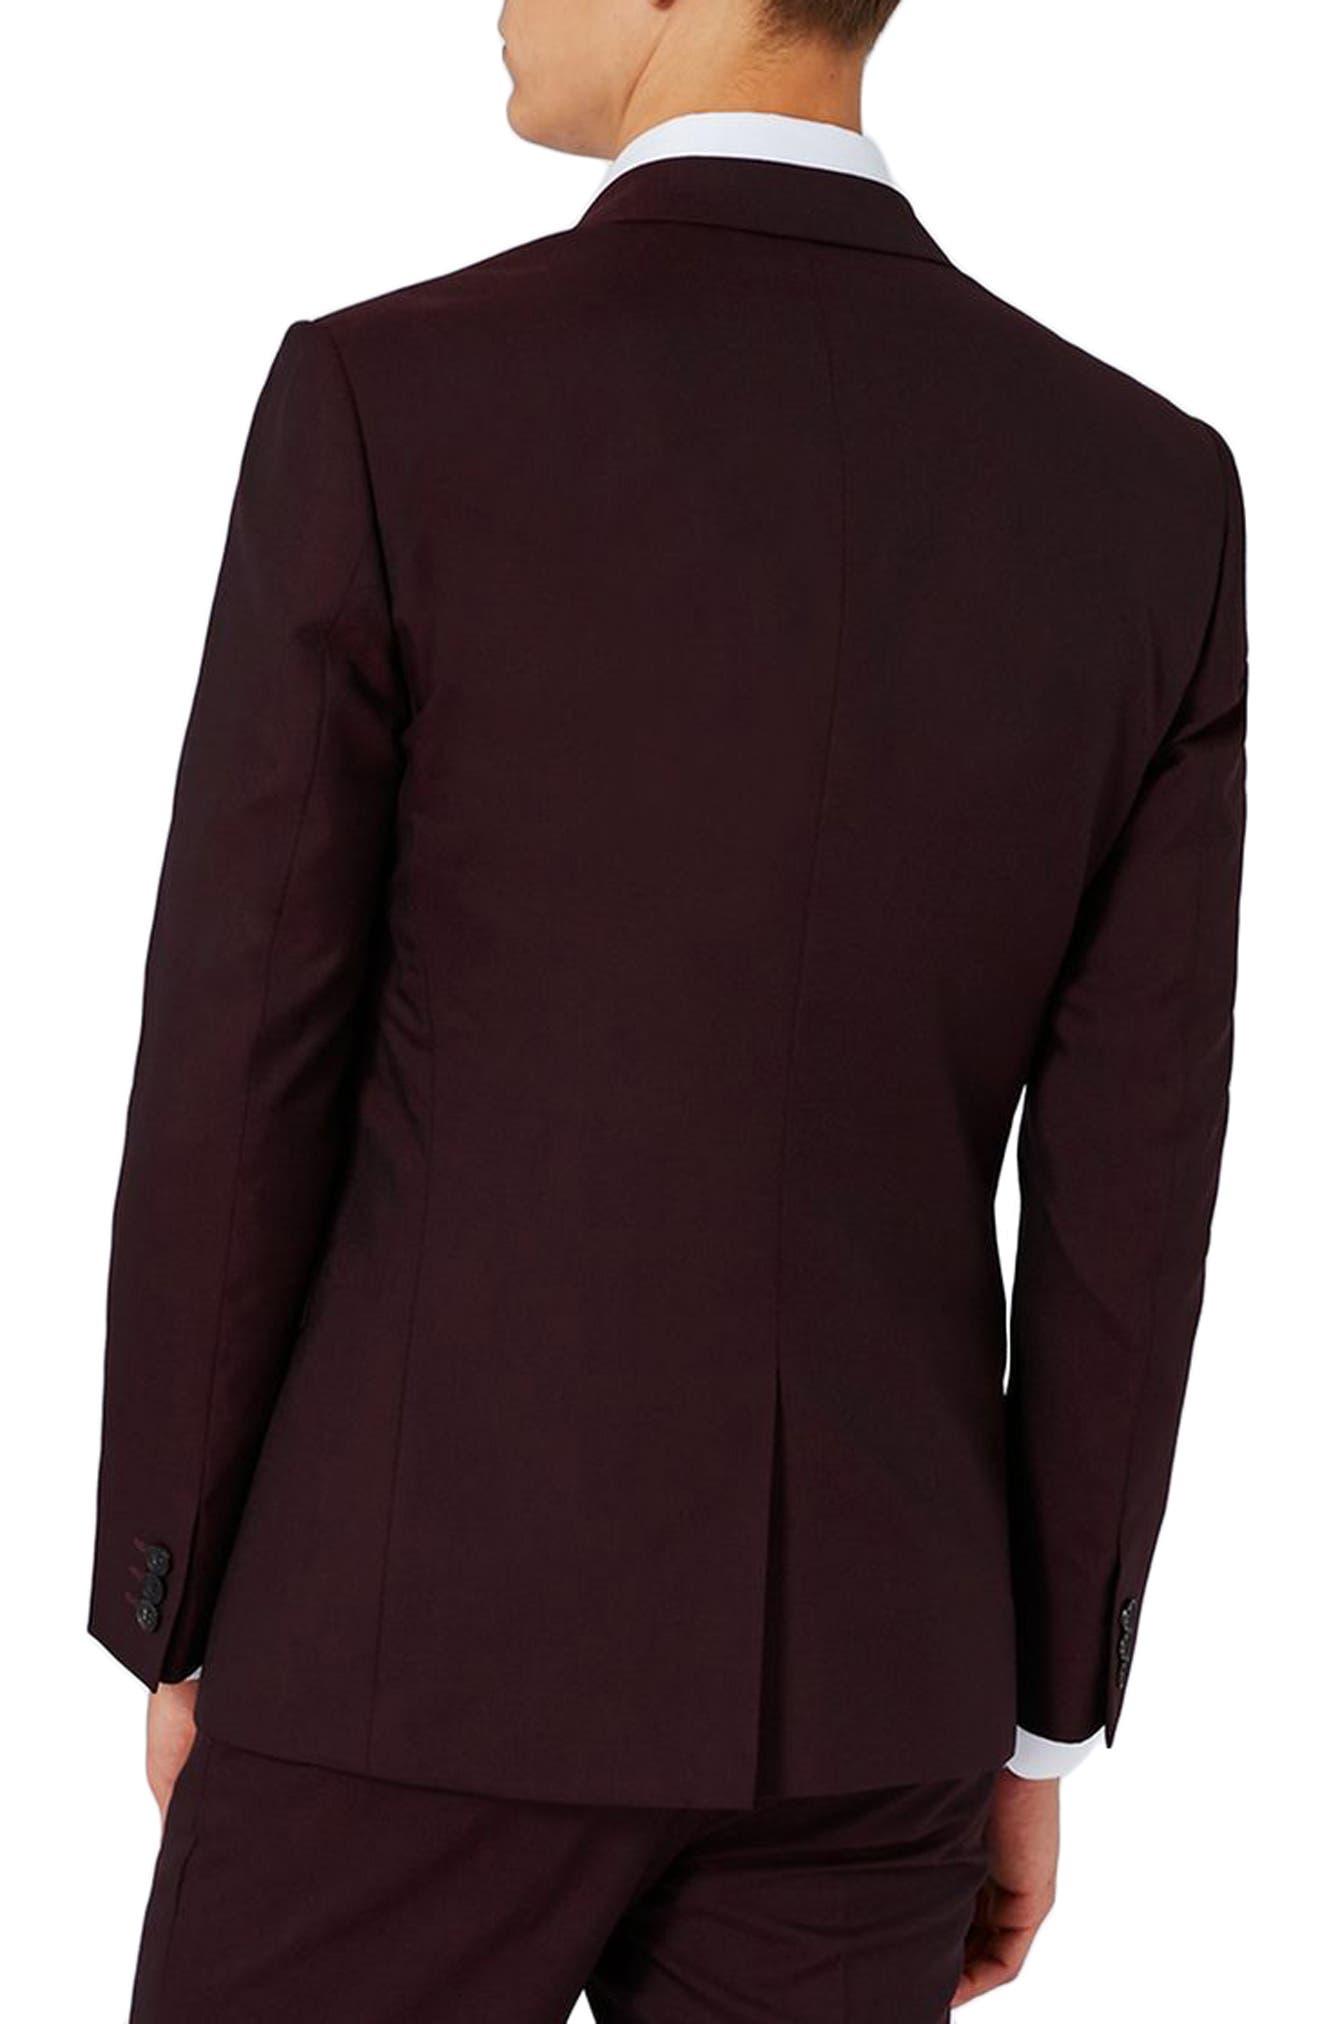 Alternate Image 3  - Charlie Casely-Hayford x Topman Skinny Fit Suit Jacket